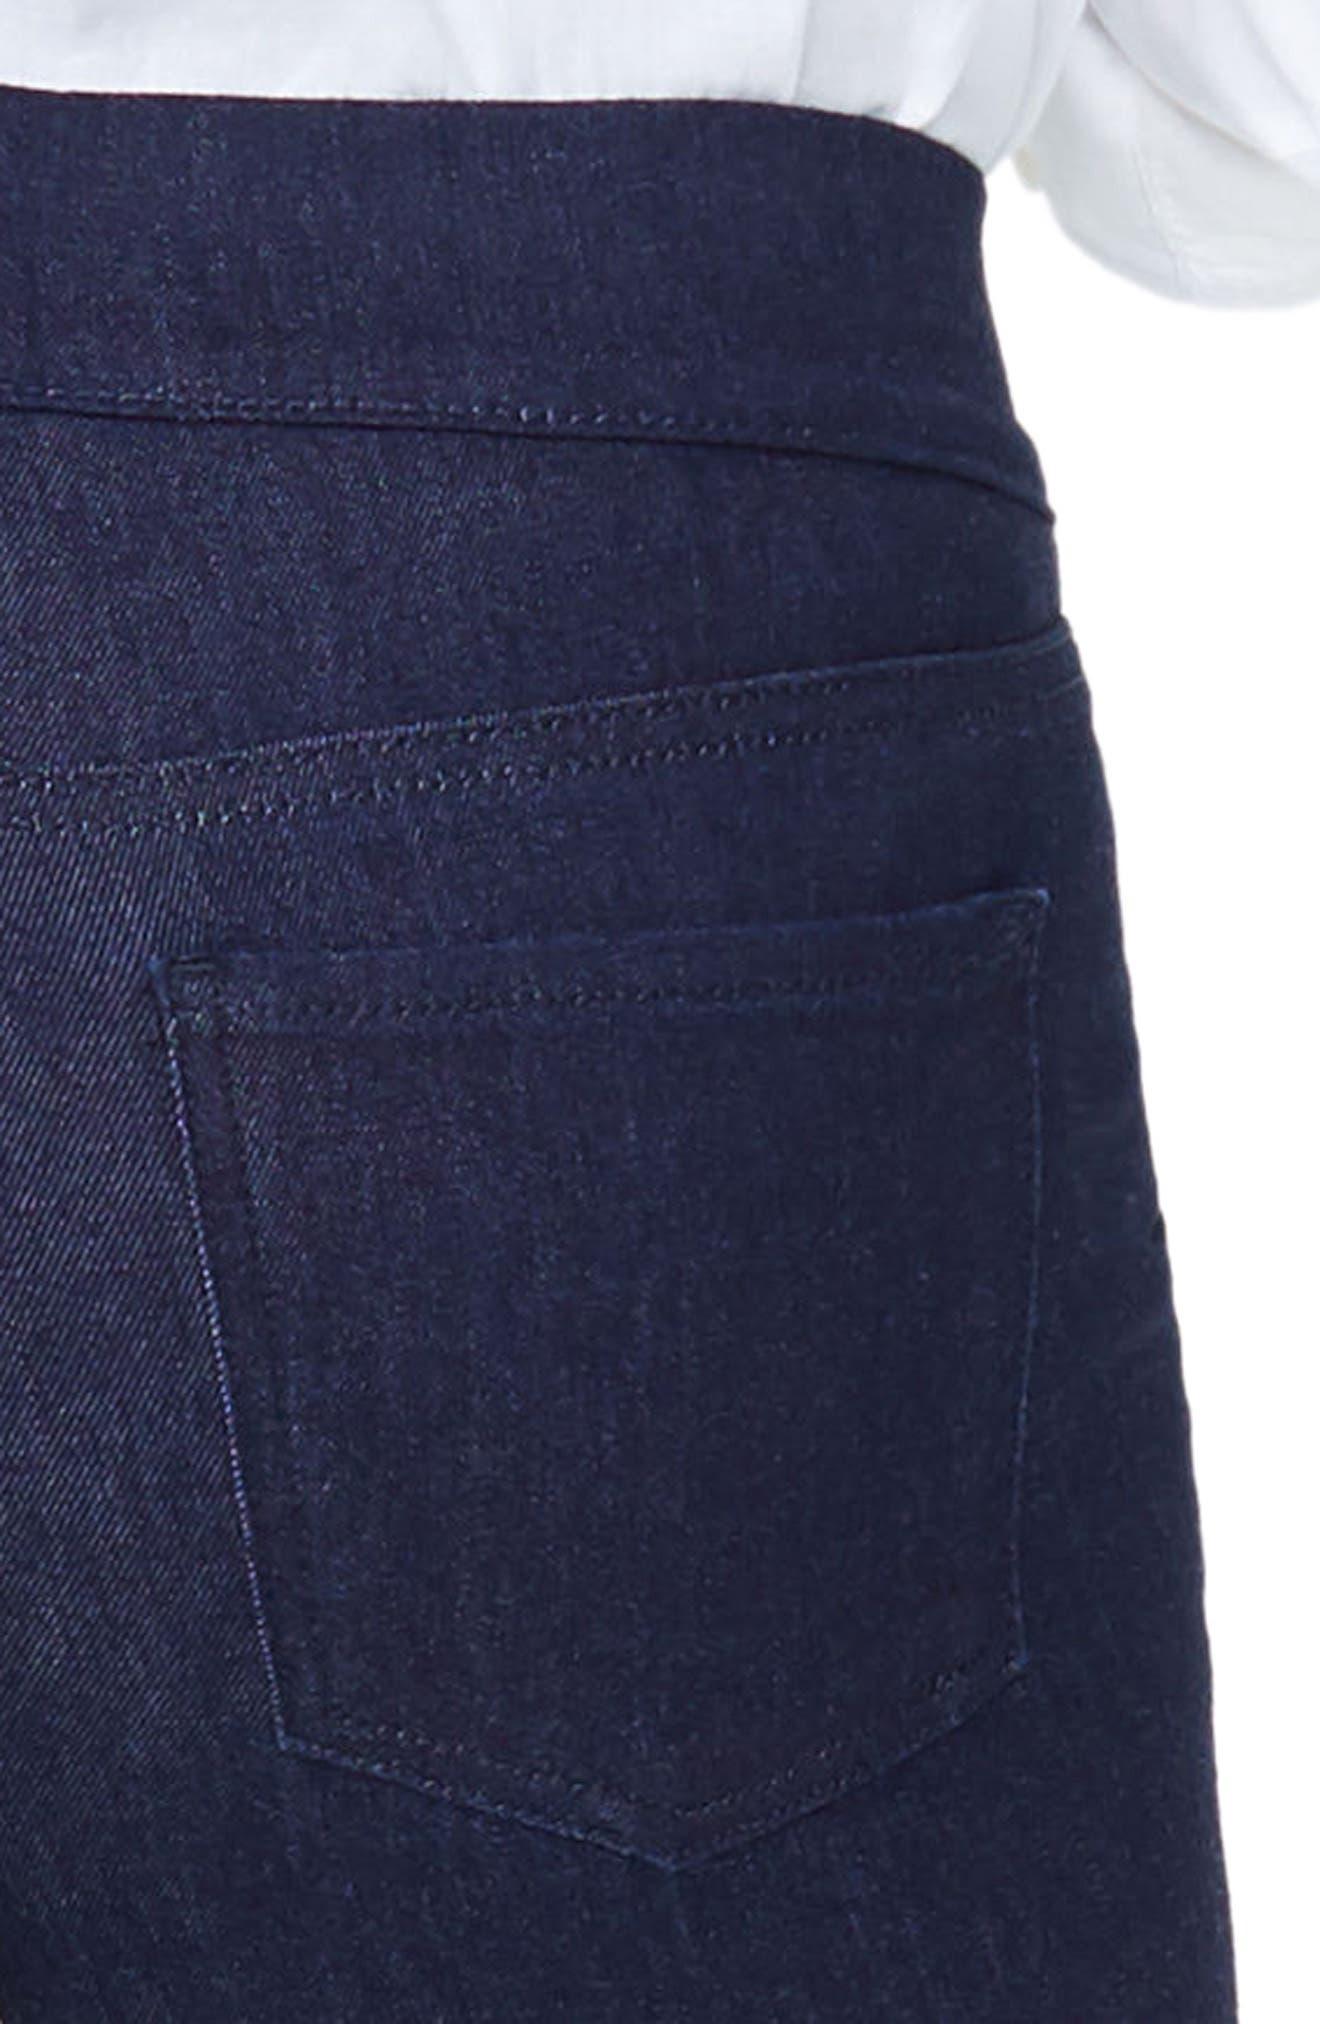 High Waist Pull-On Stretch Skinny Capri Jeans,                             Alternate thumbnail 4, color,                             408